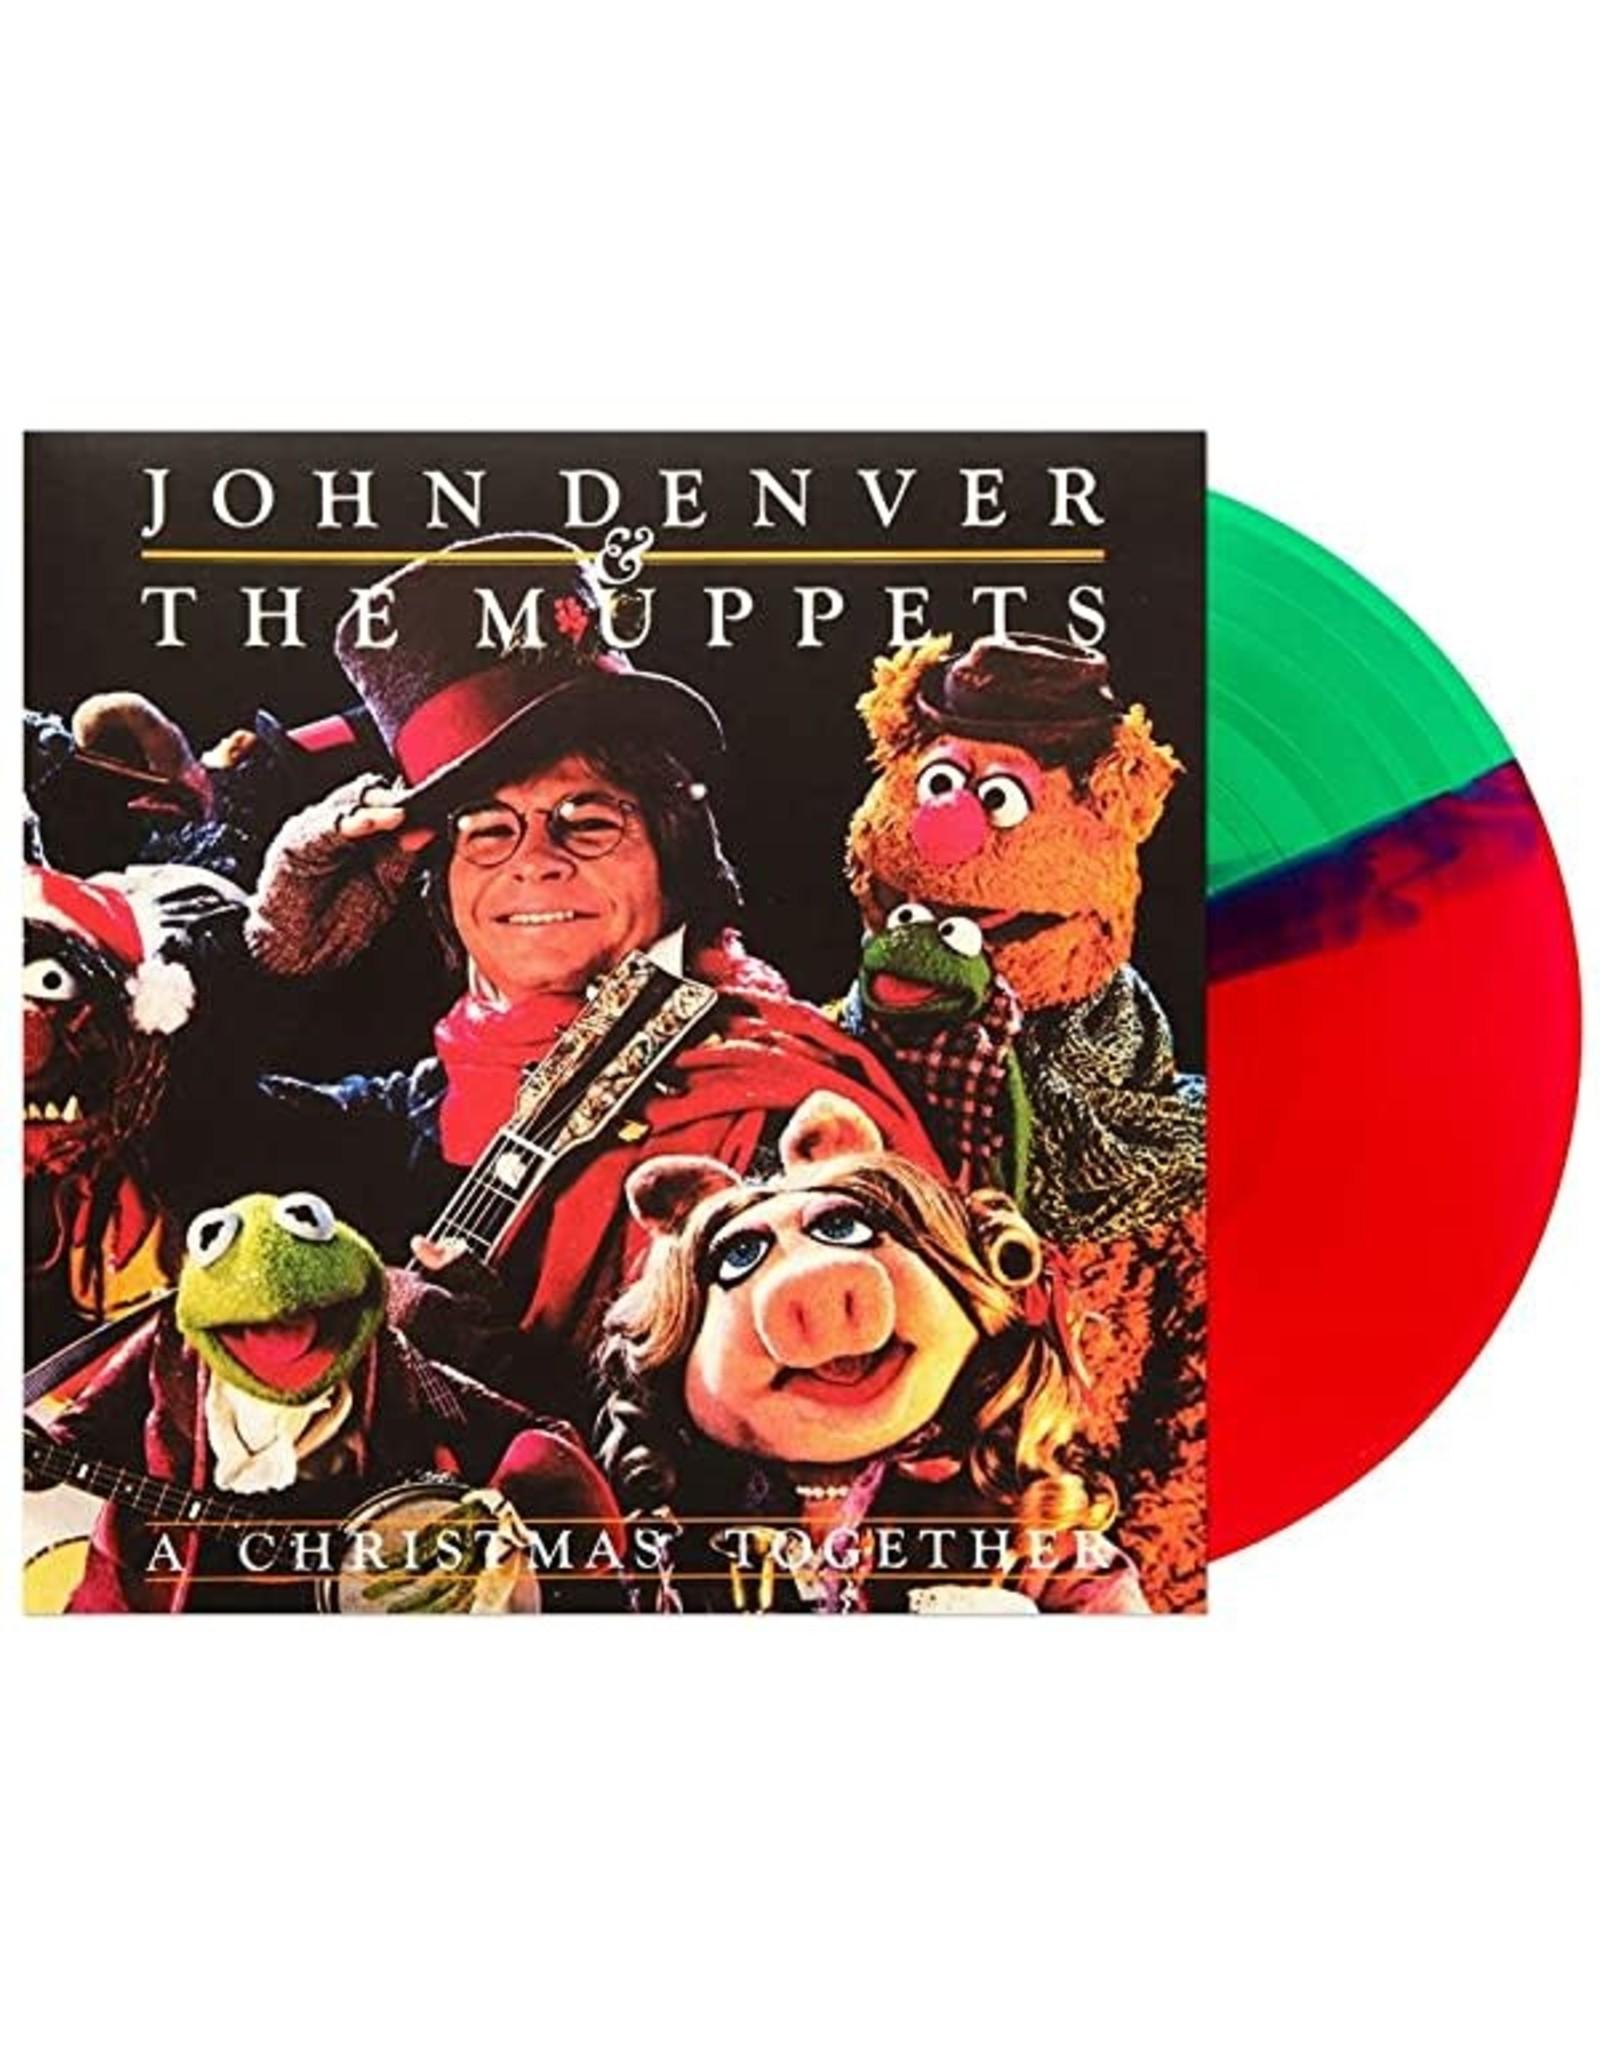 Denver, John & The Muppets - A Christmas Together LP